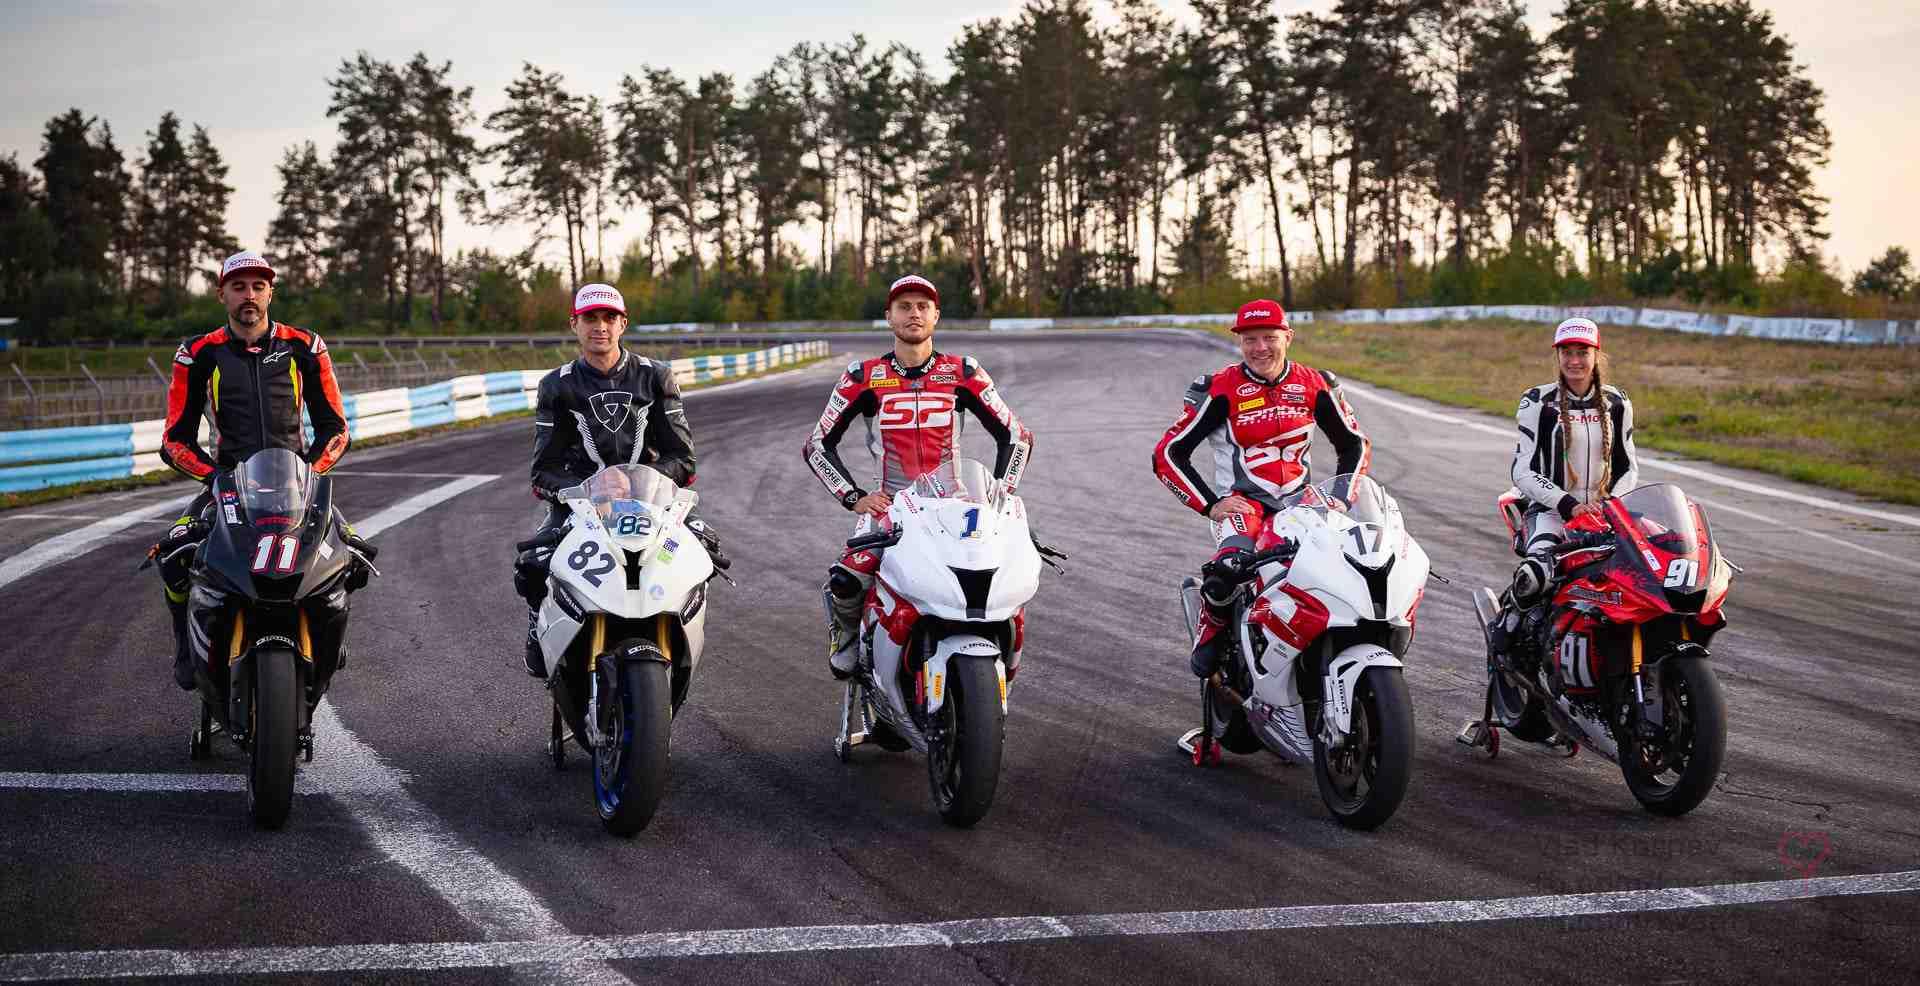 5-6_etap_MotoGPUkraine_145